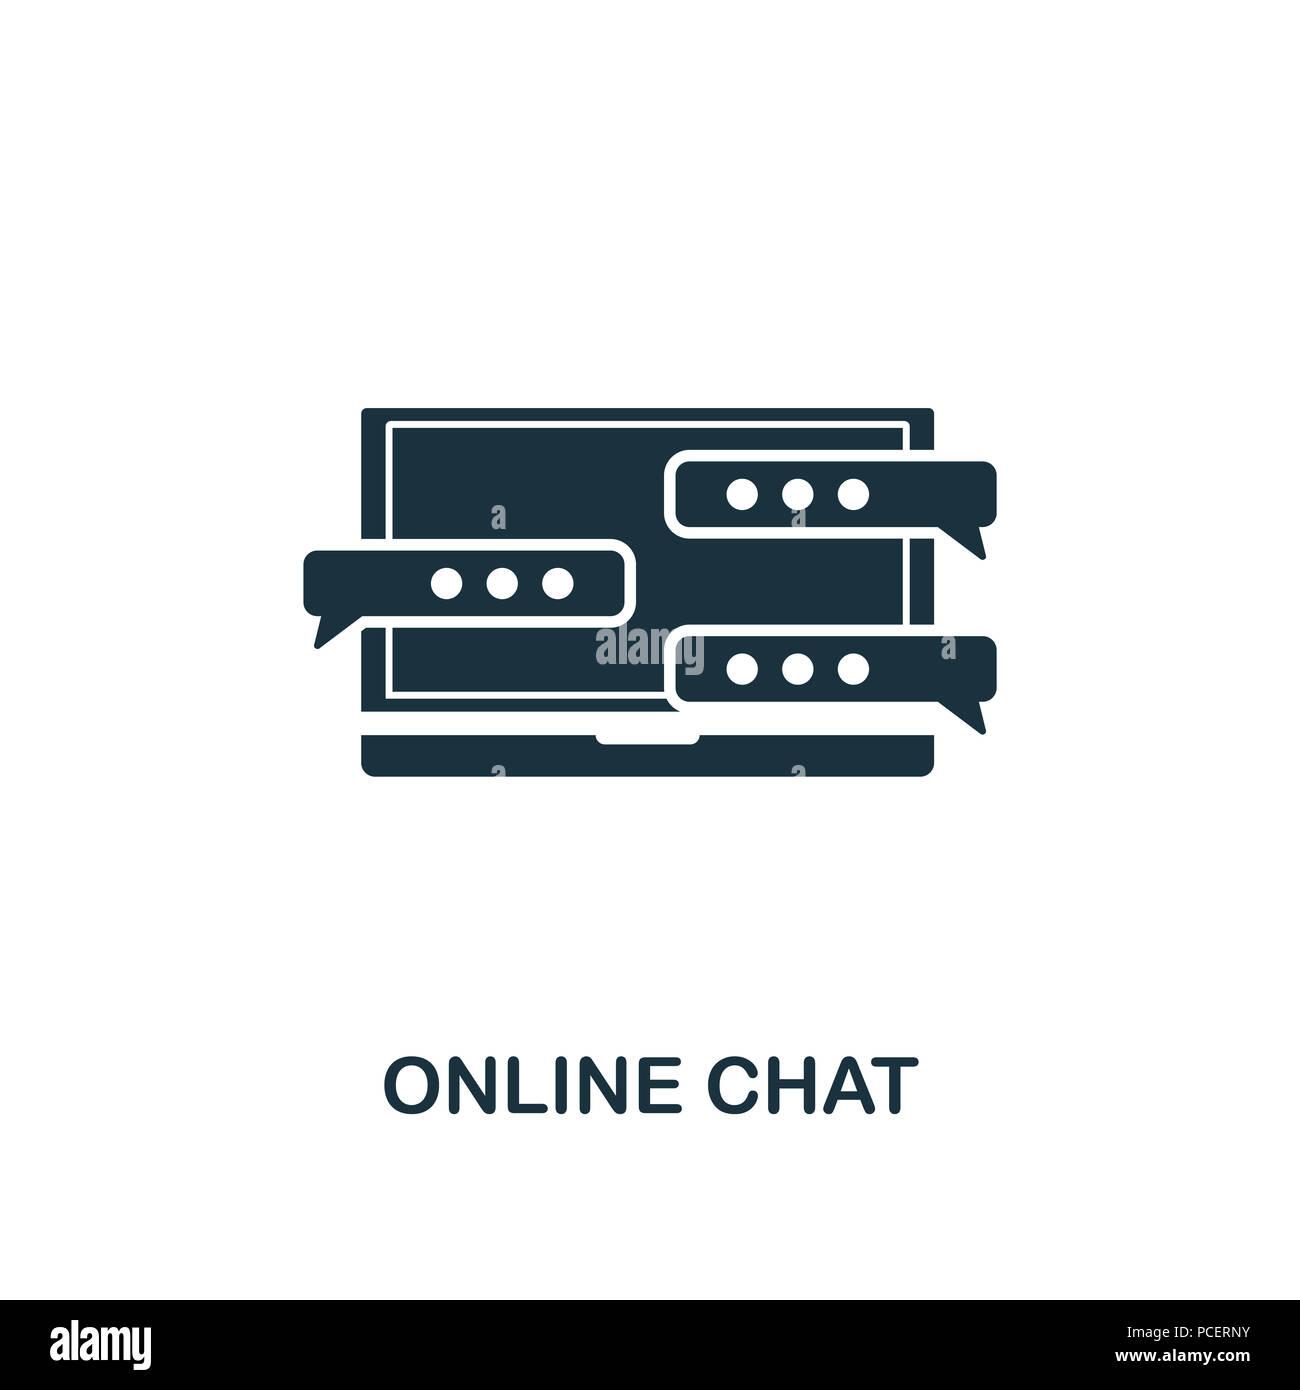 slogan creativi per incontri online